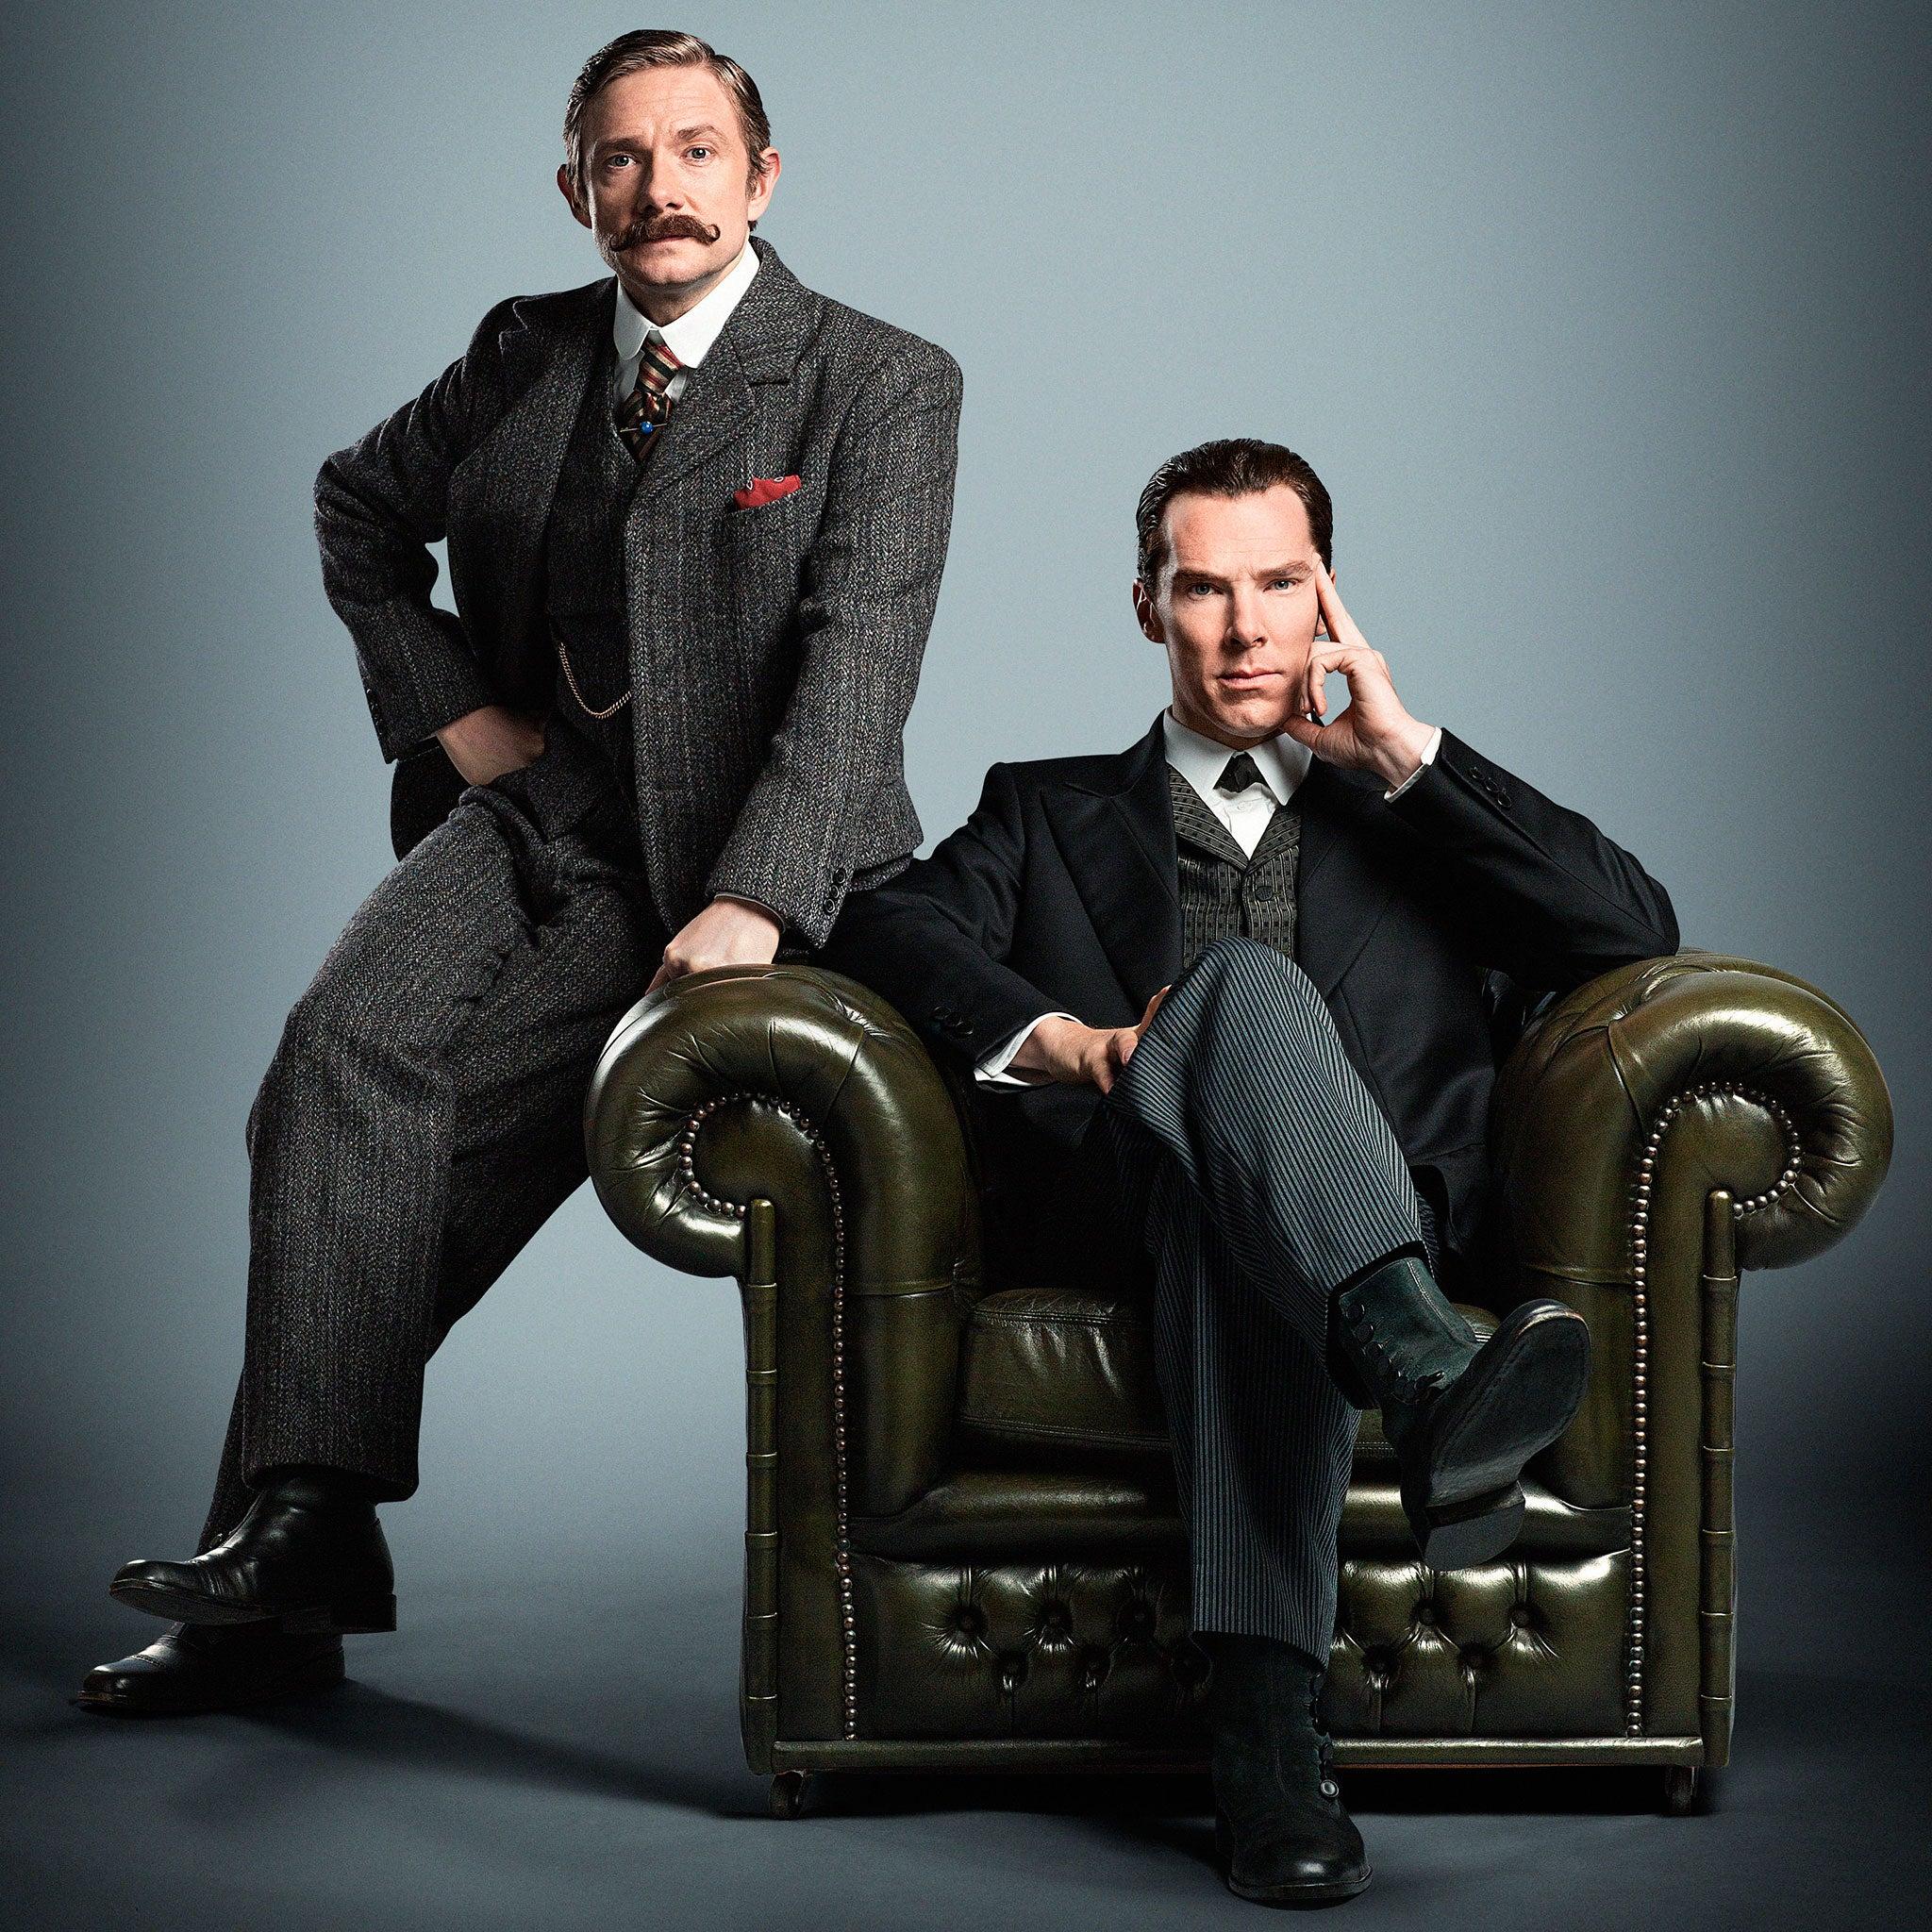 Sherlock season 4 trailer: First glimpse of Benedict Cumberbatch ...